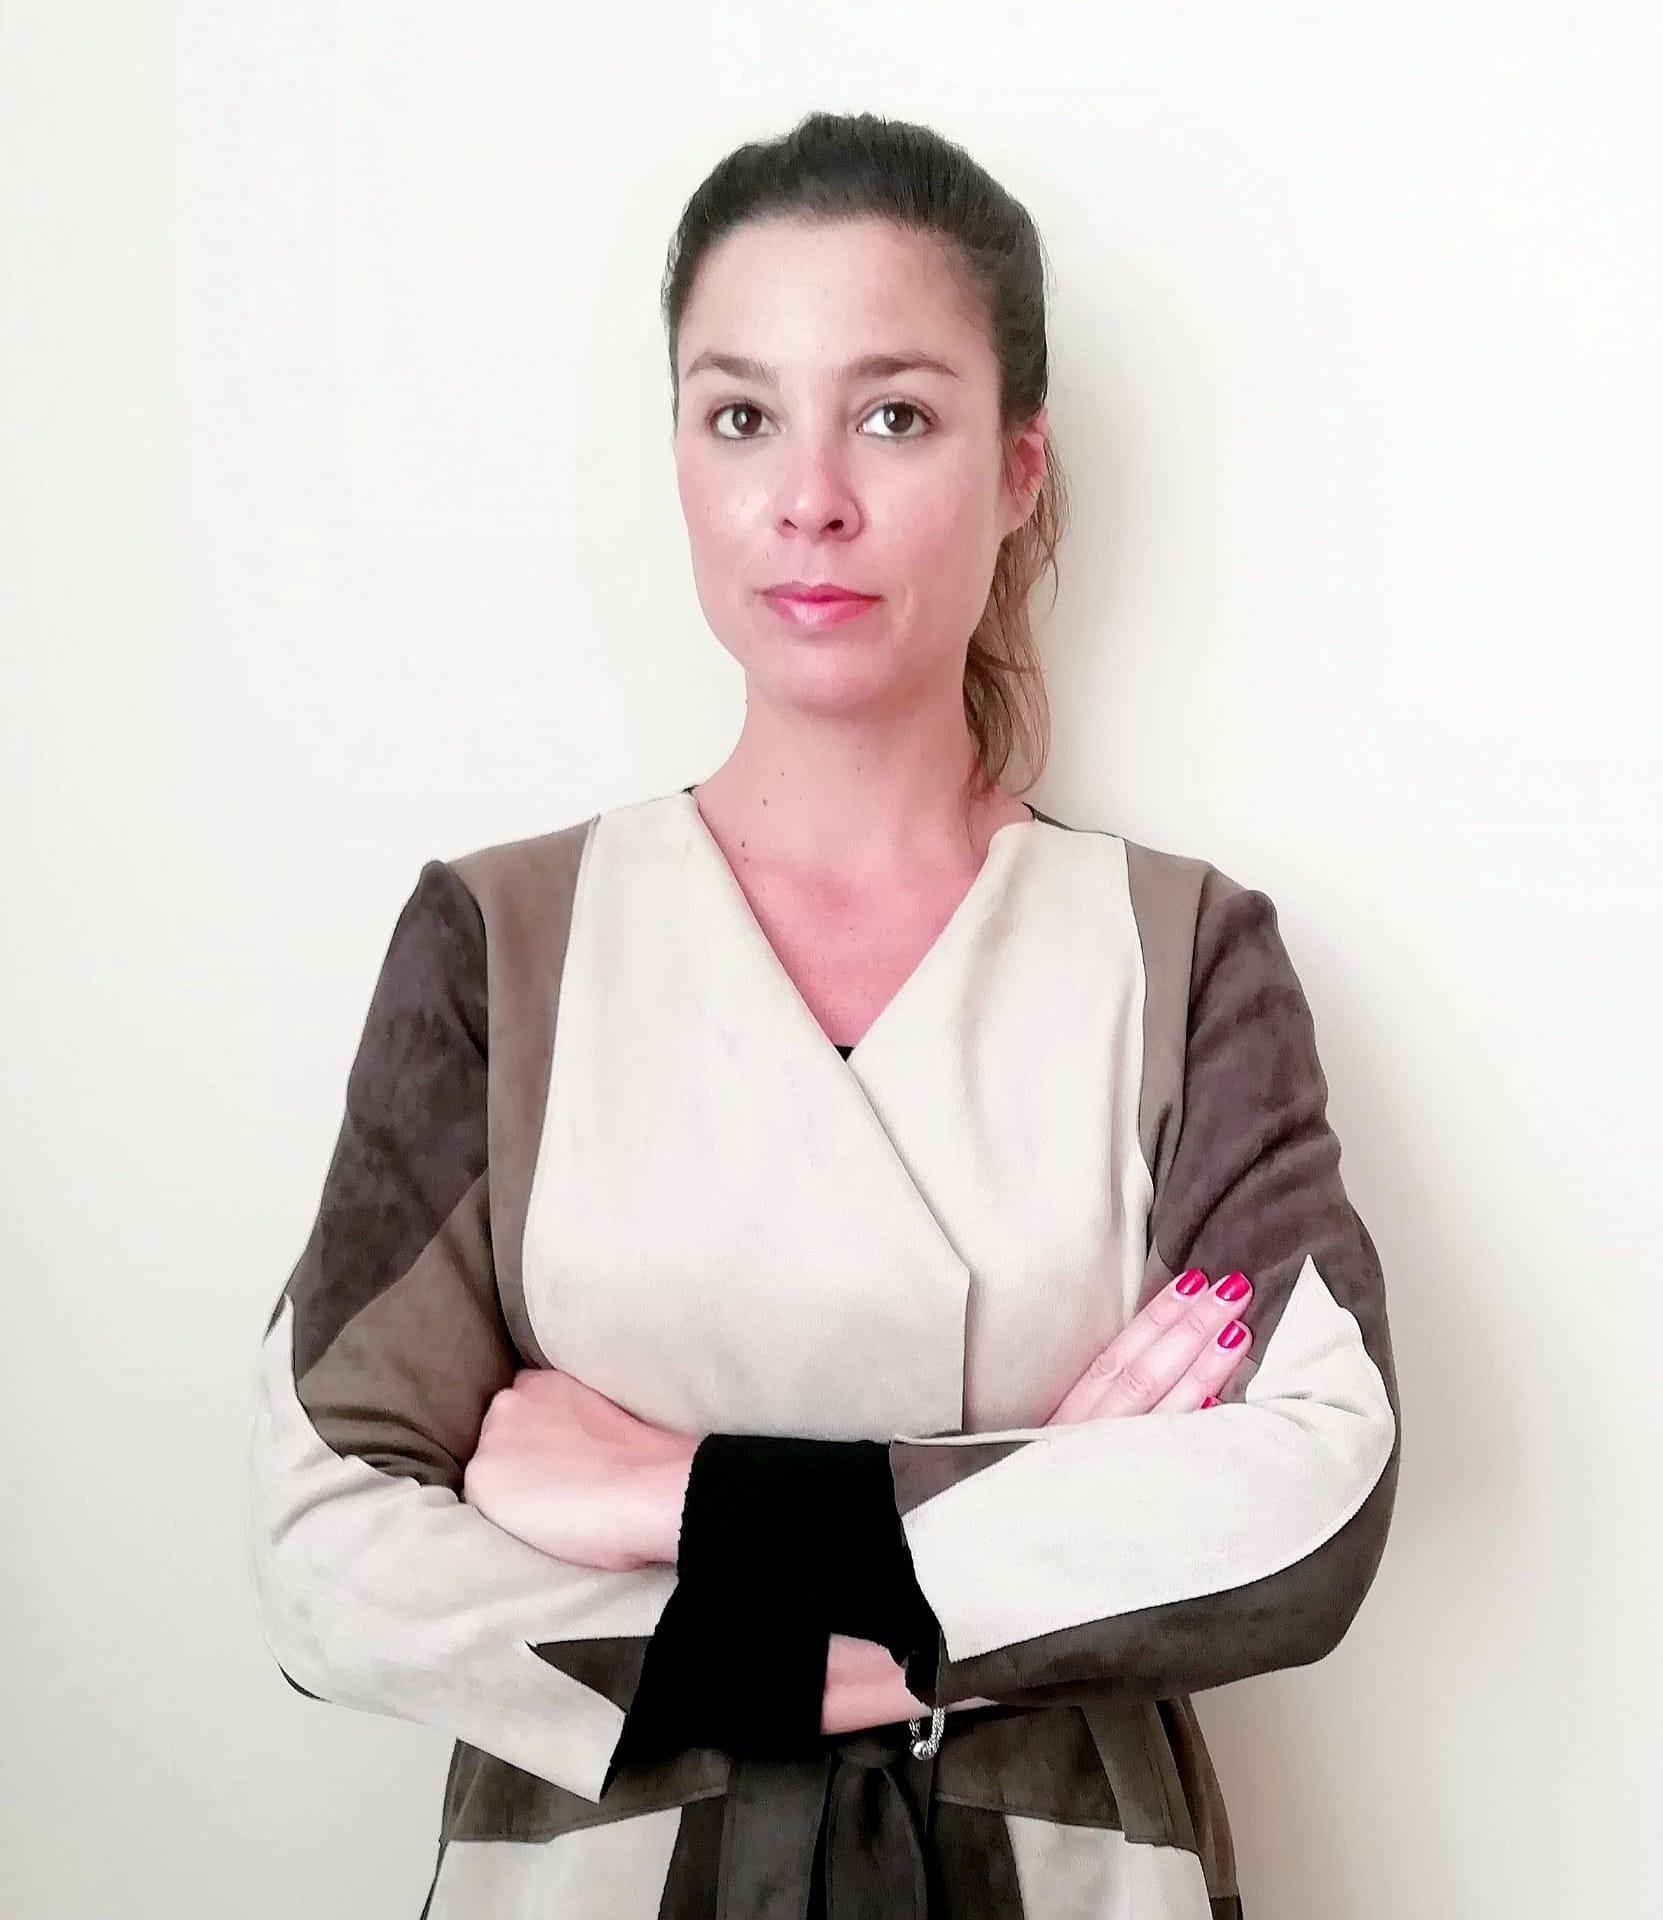 Ana Pimentel